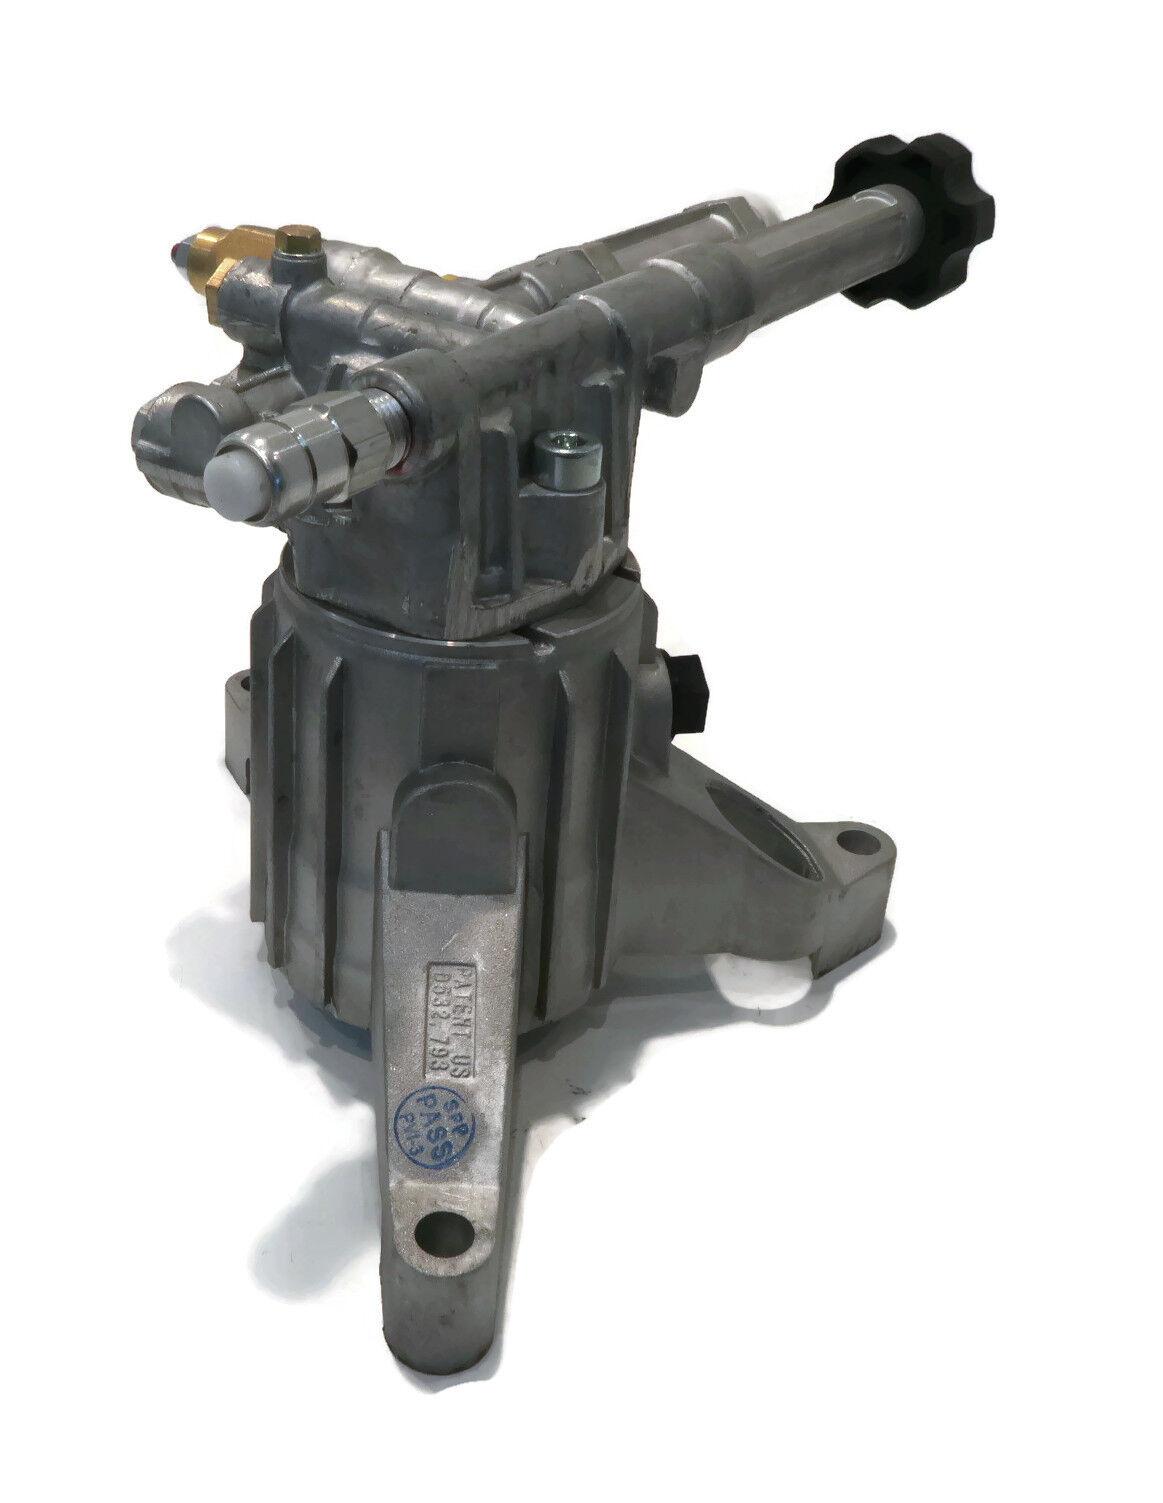 OEM AR 2600 psi POWER PRESSURE WASHER WATER PUMP Brute 020291-0 020291-1 Engine